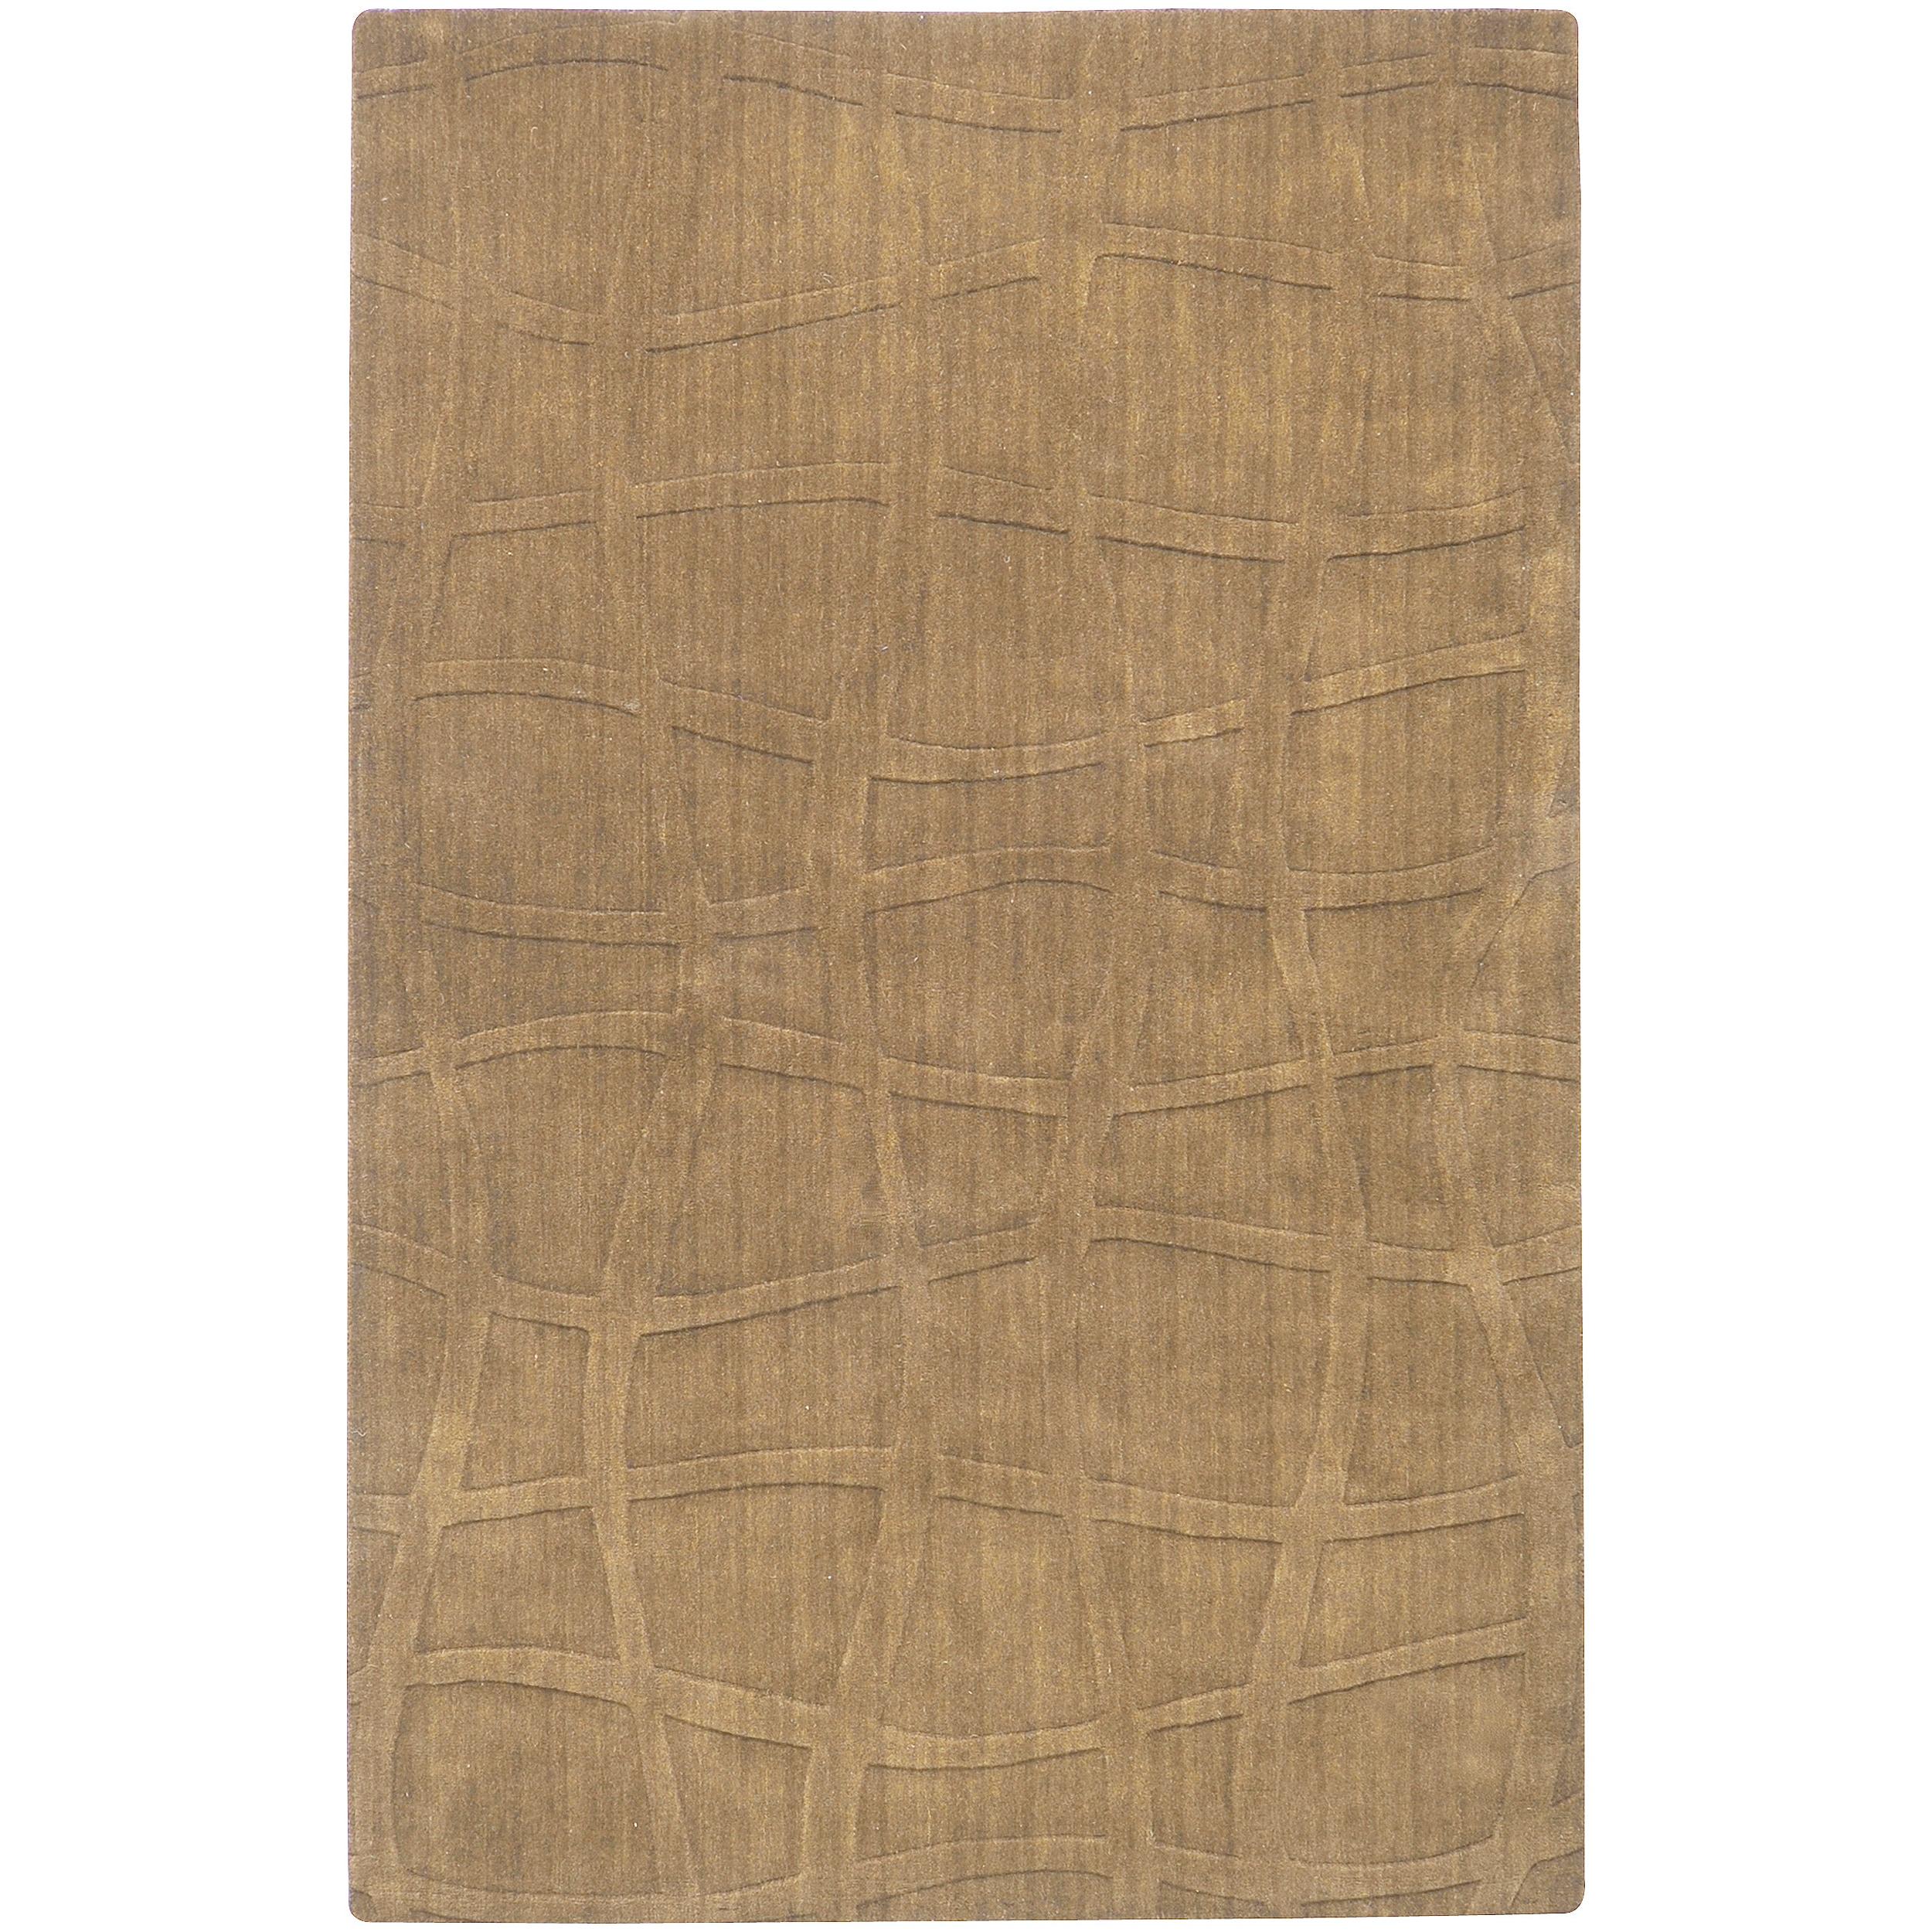 Candice Olson Loomed Green Ibare Abstract Plush Wool Rug (5' x 8')